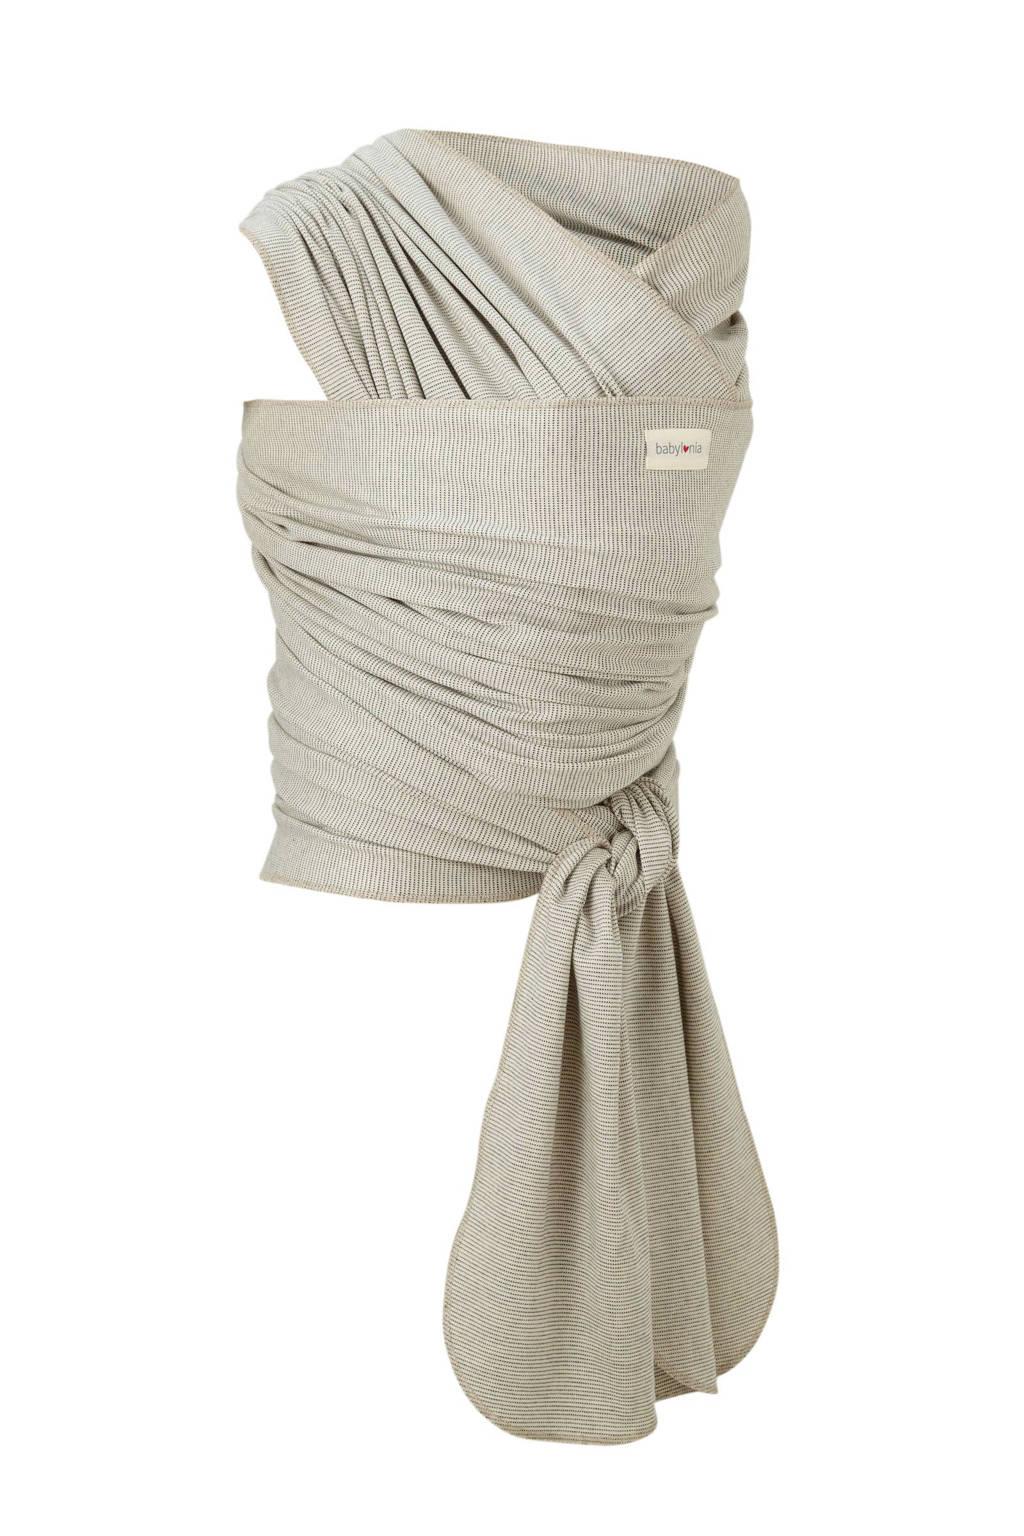 Babylonia draagdoek tricot-slen bamboo ecru, Ecru